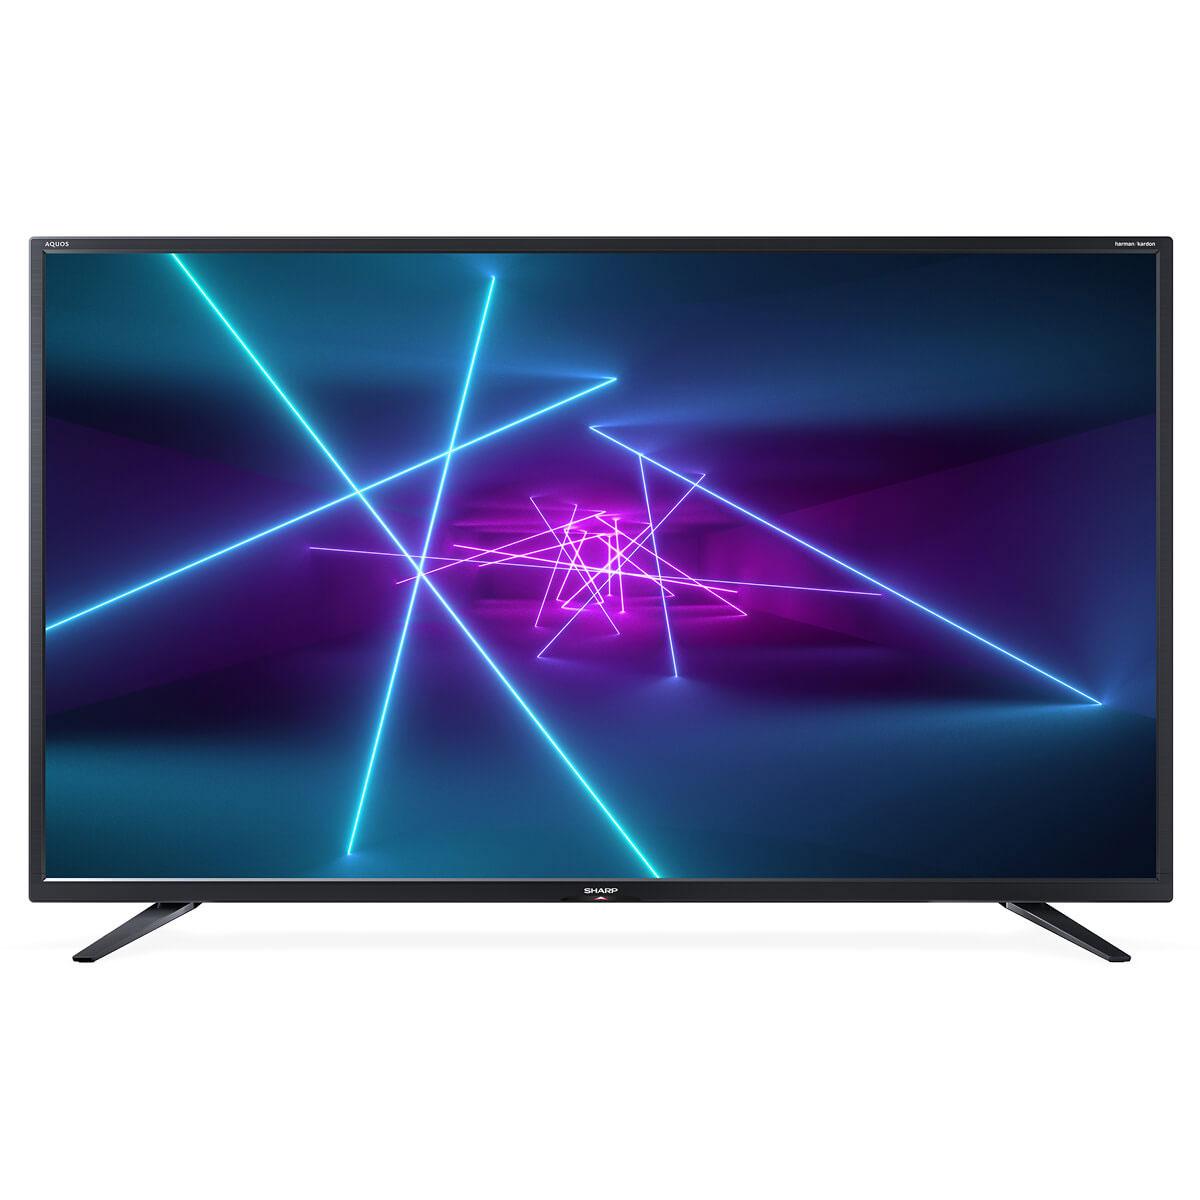 "TV Sharp LC-40UI7452E Téléviseur LED 4K Ultra HD 40"" (102 cm) - 3840 x 2160 pixels - Ultra HD - HDR - Wi-Fi - DLNA - Harman/Kardon - 400 Hz"